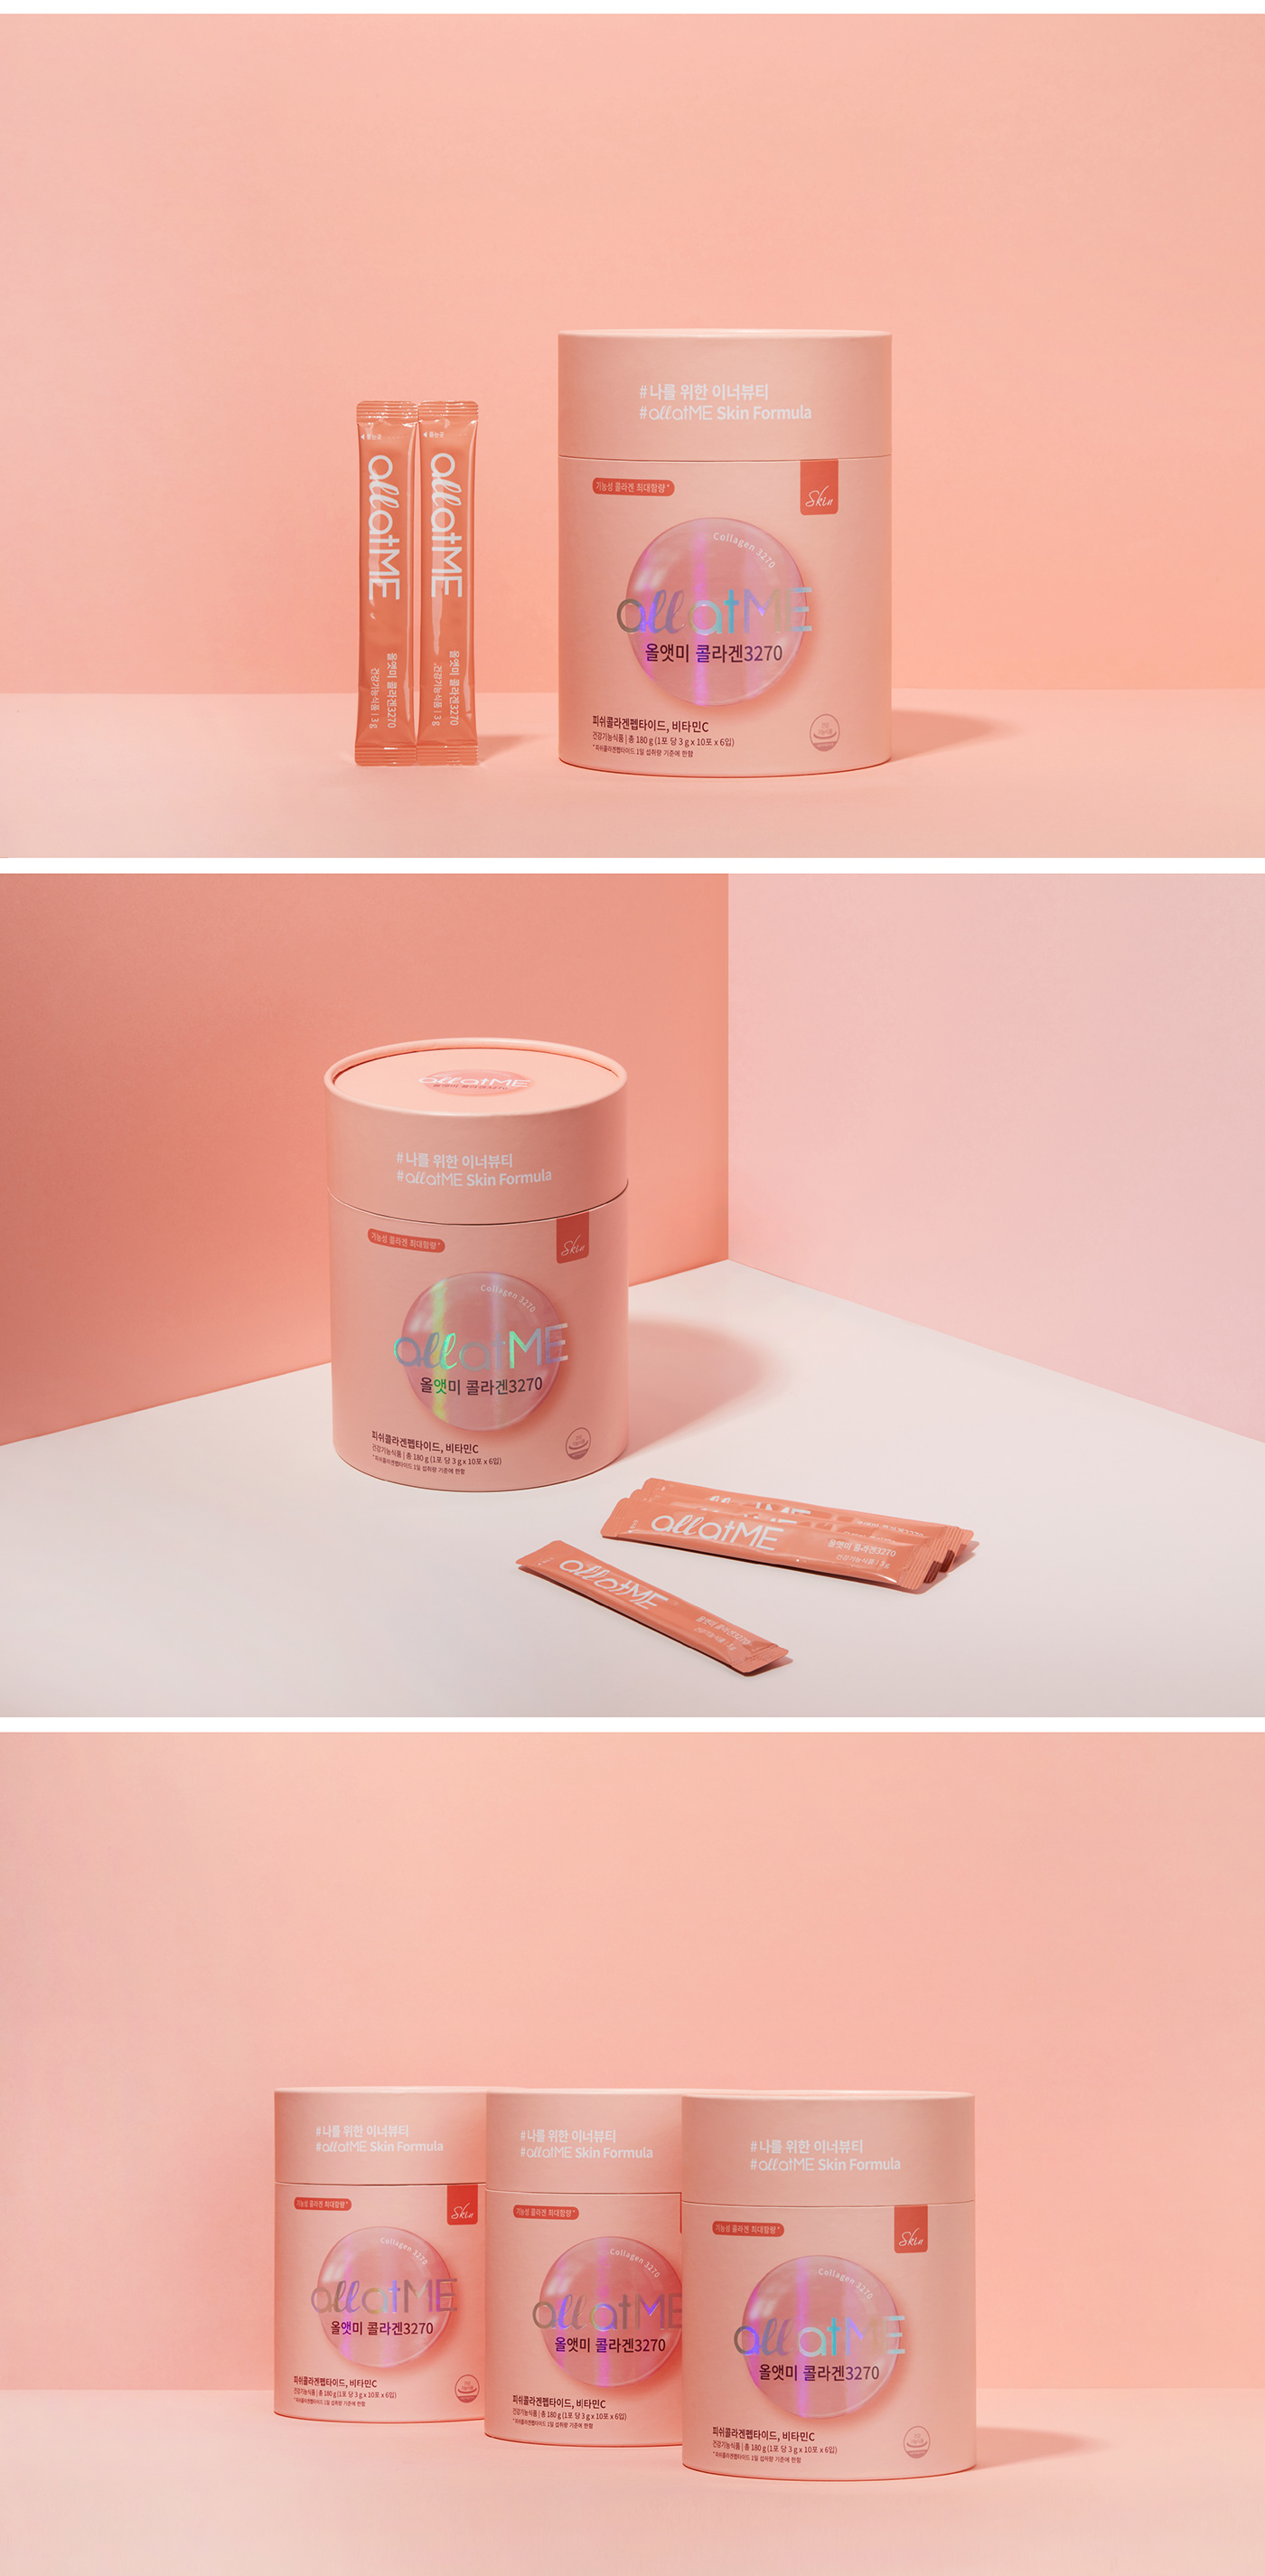 beauty branding  collagen heathcare logo nutrient package design  Packaging symbol graphic design